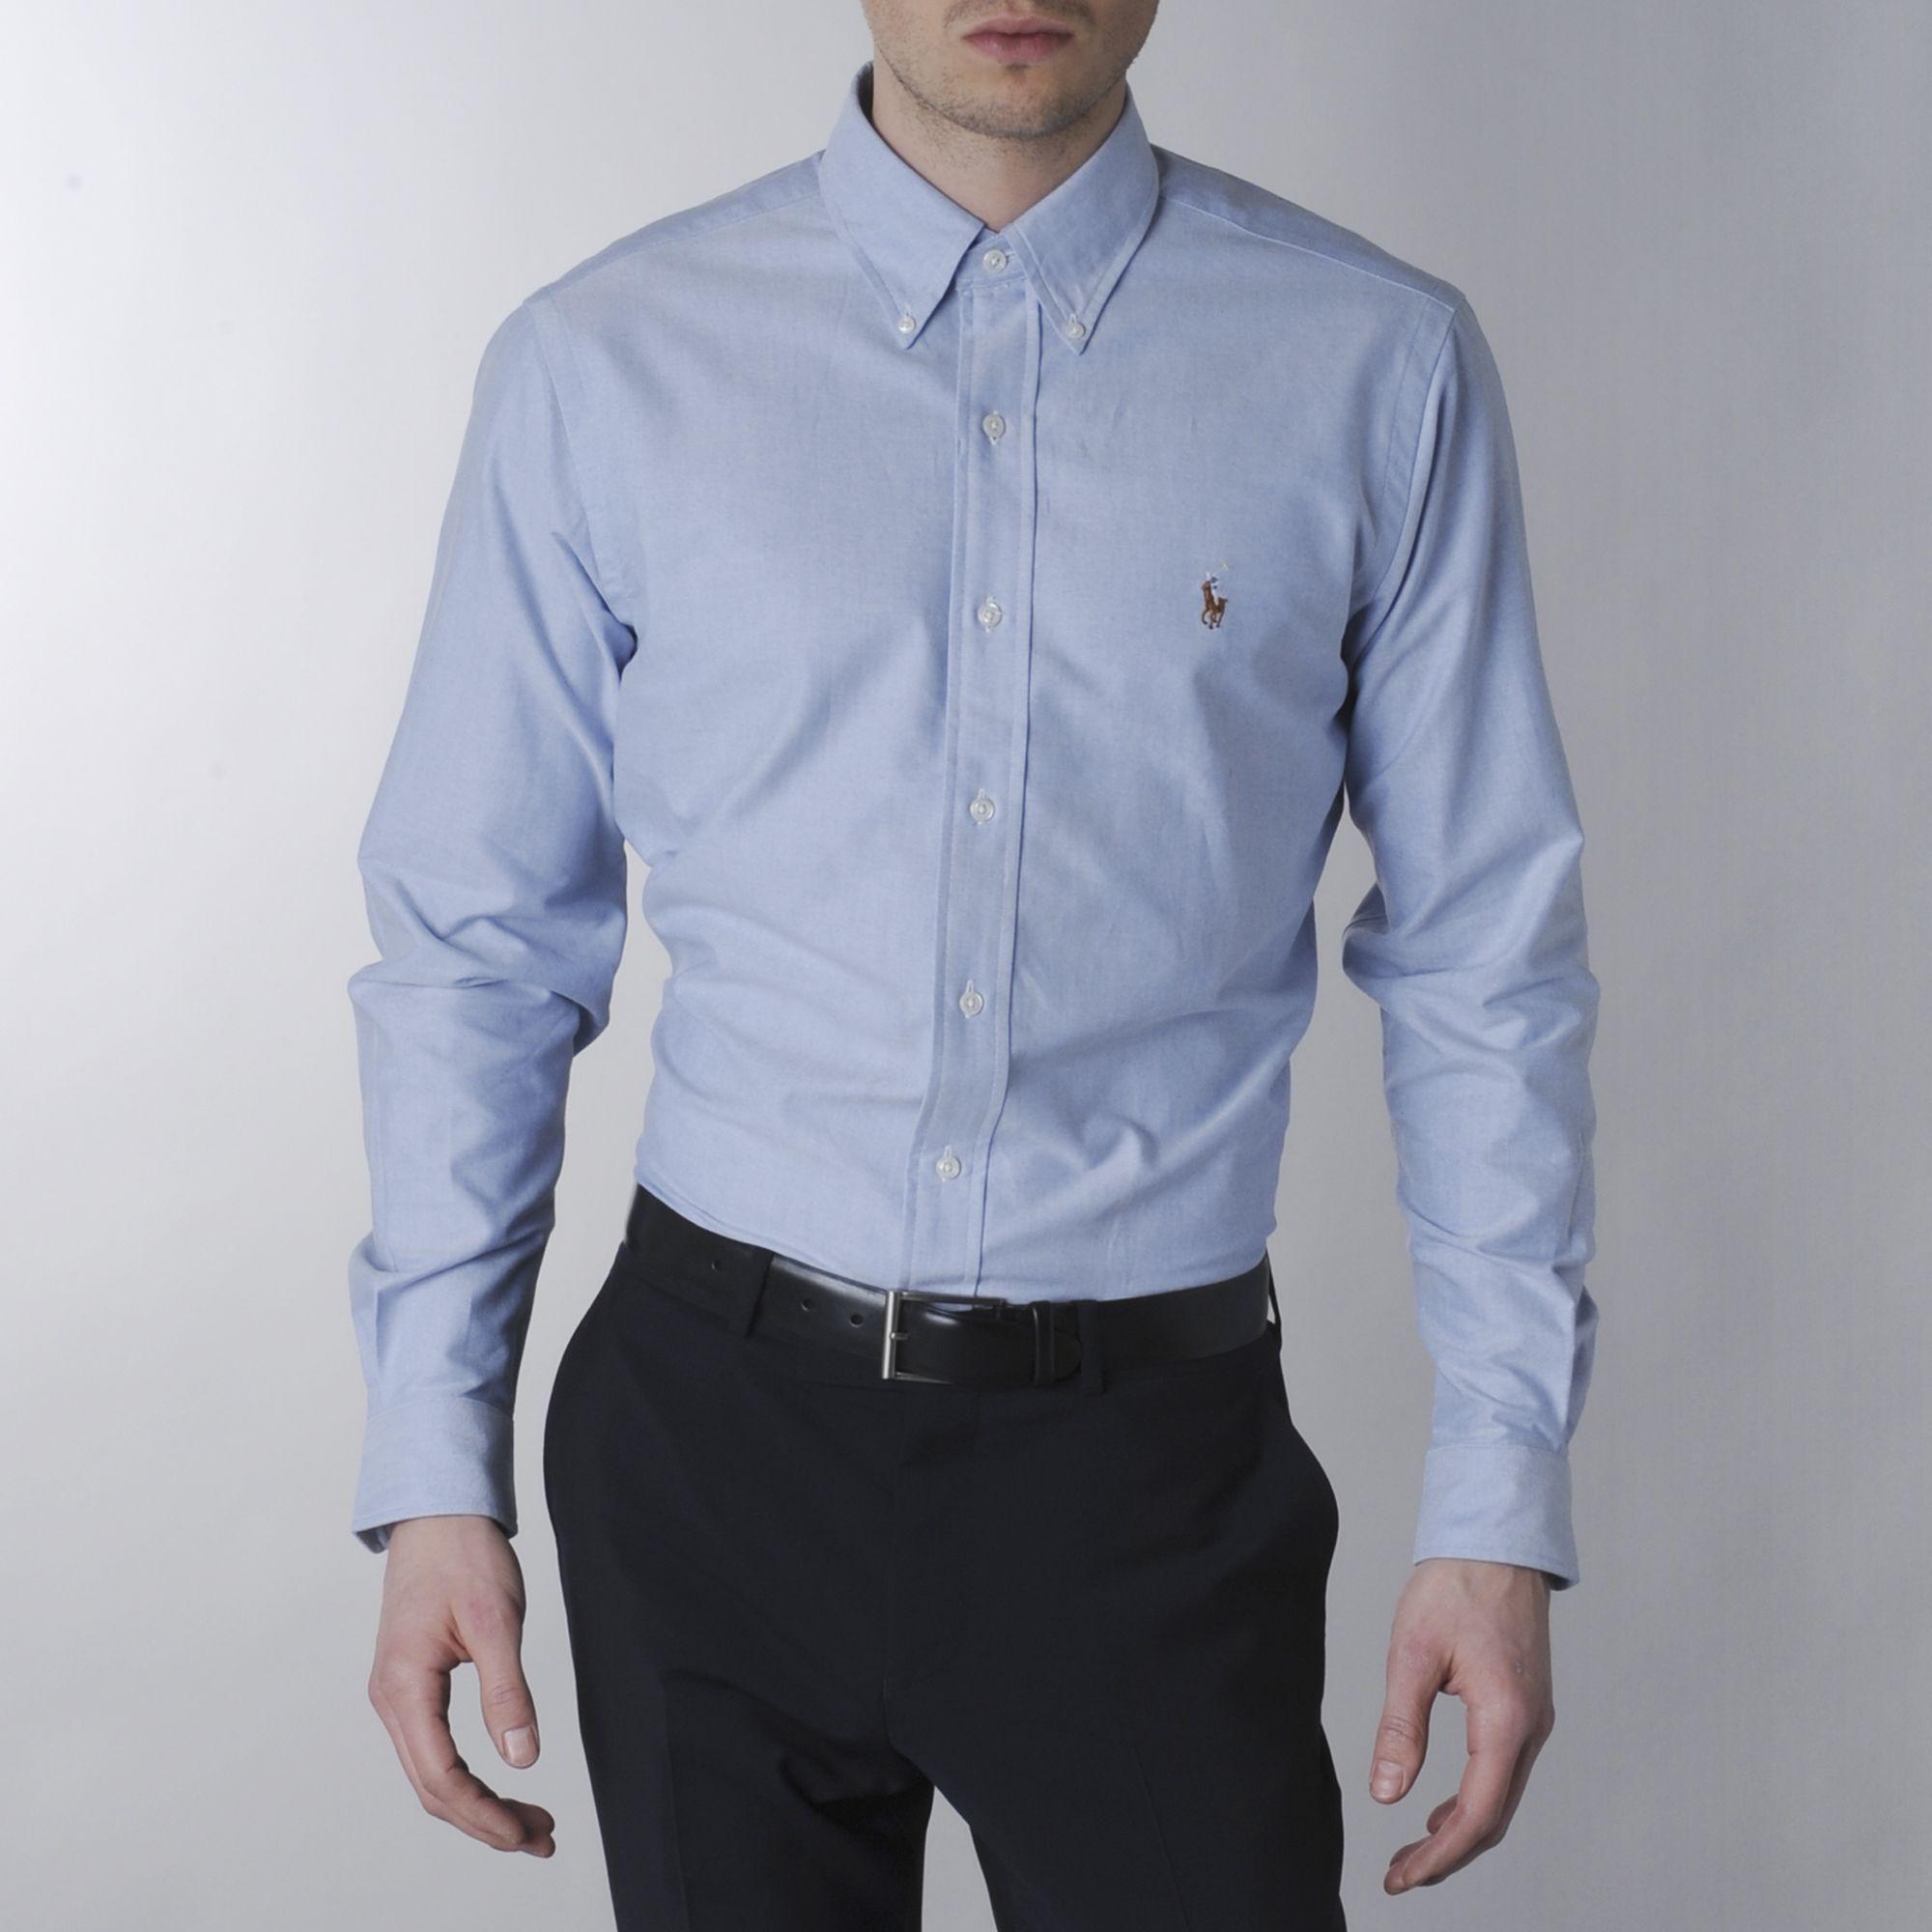 c343ad82a96b Ralph Lauren Classic Oxford Dress Shirt in Blue for Men - Lyst